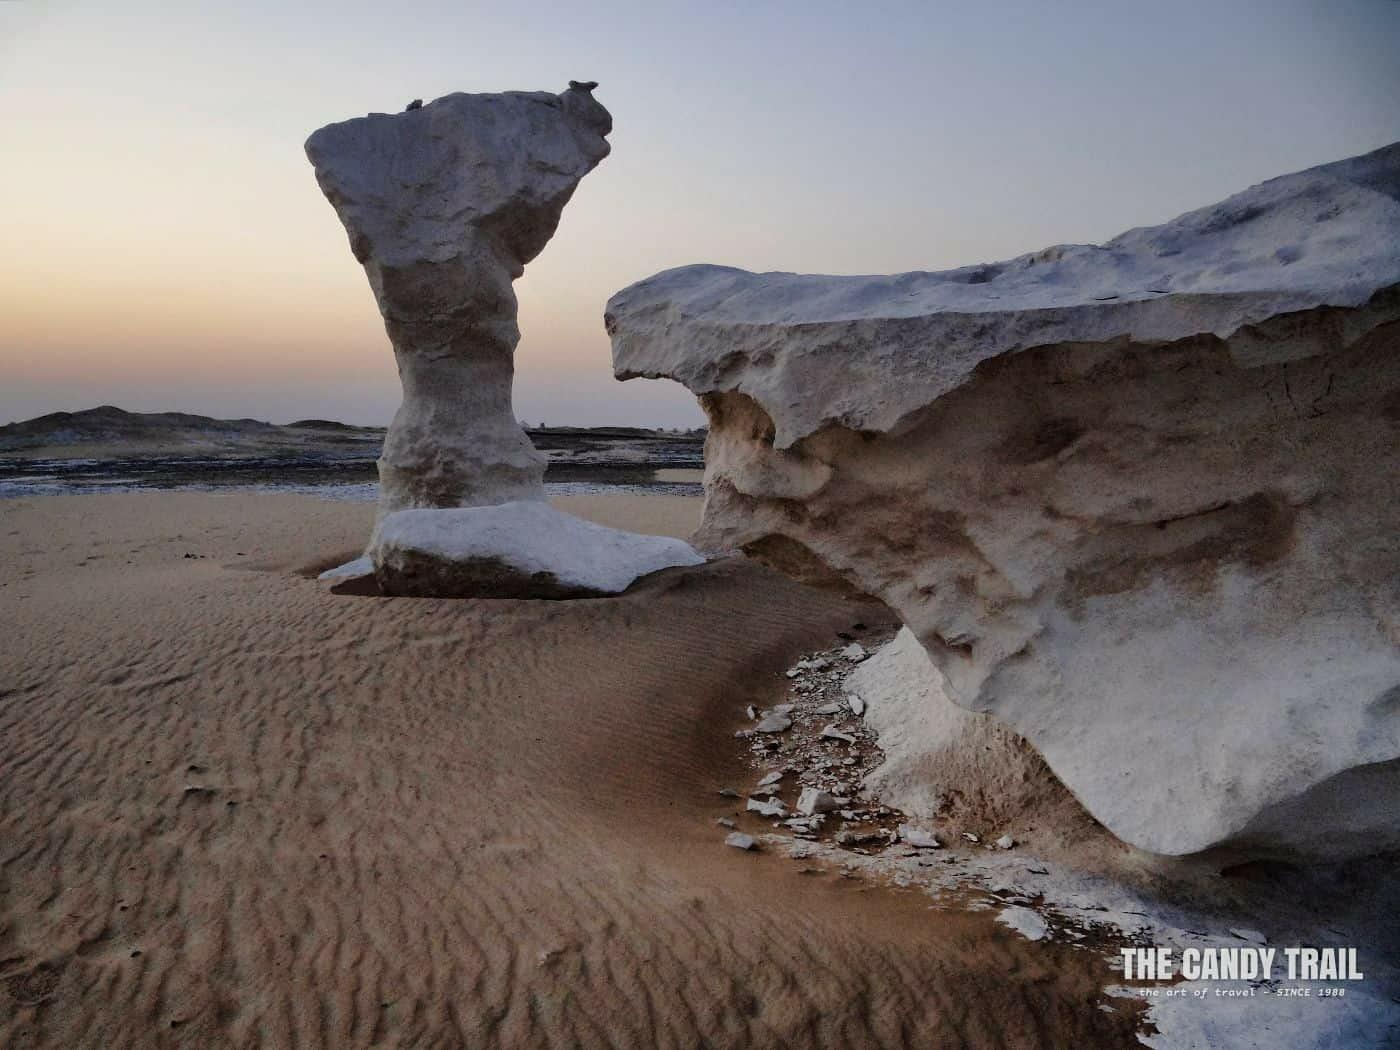 Dawn and awaiting the sunrise white desert